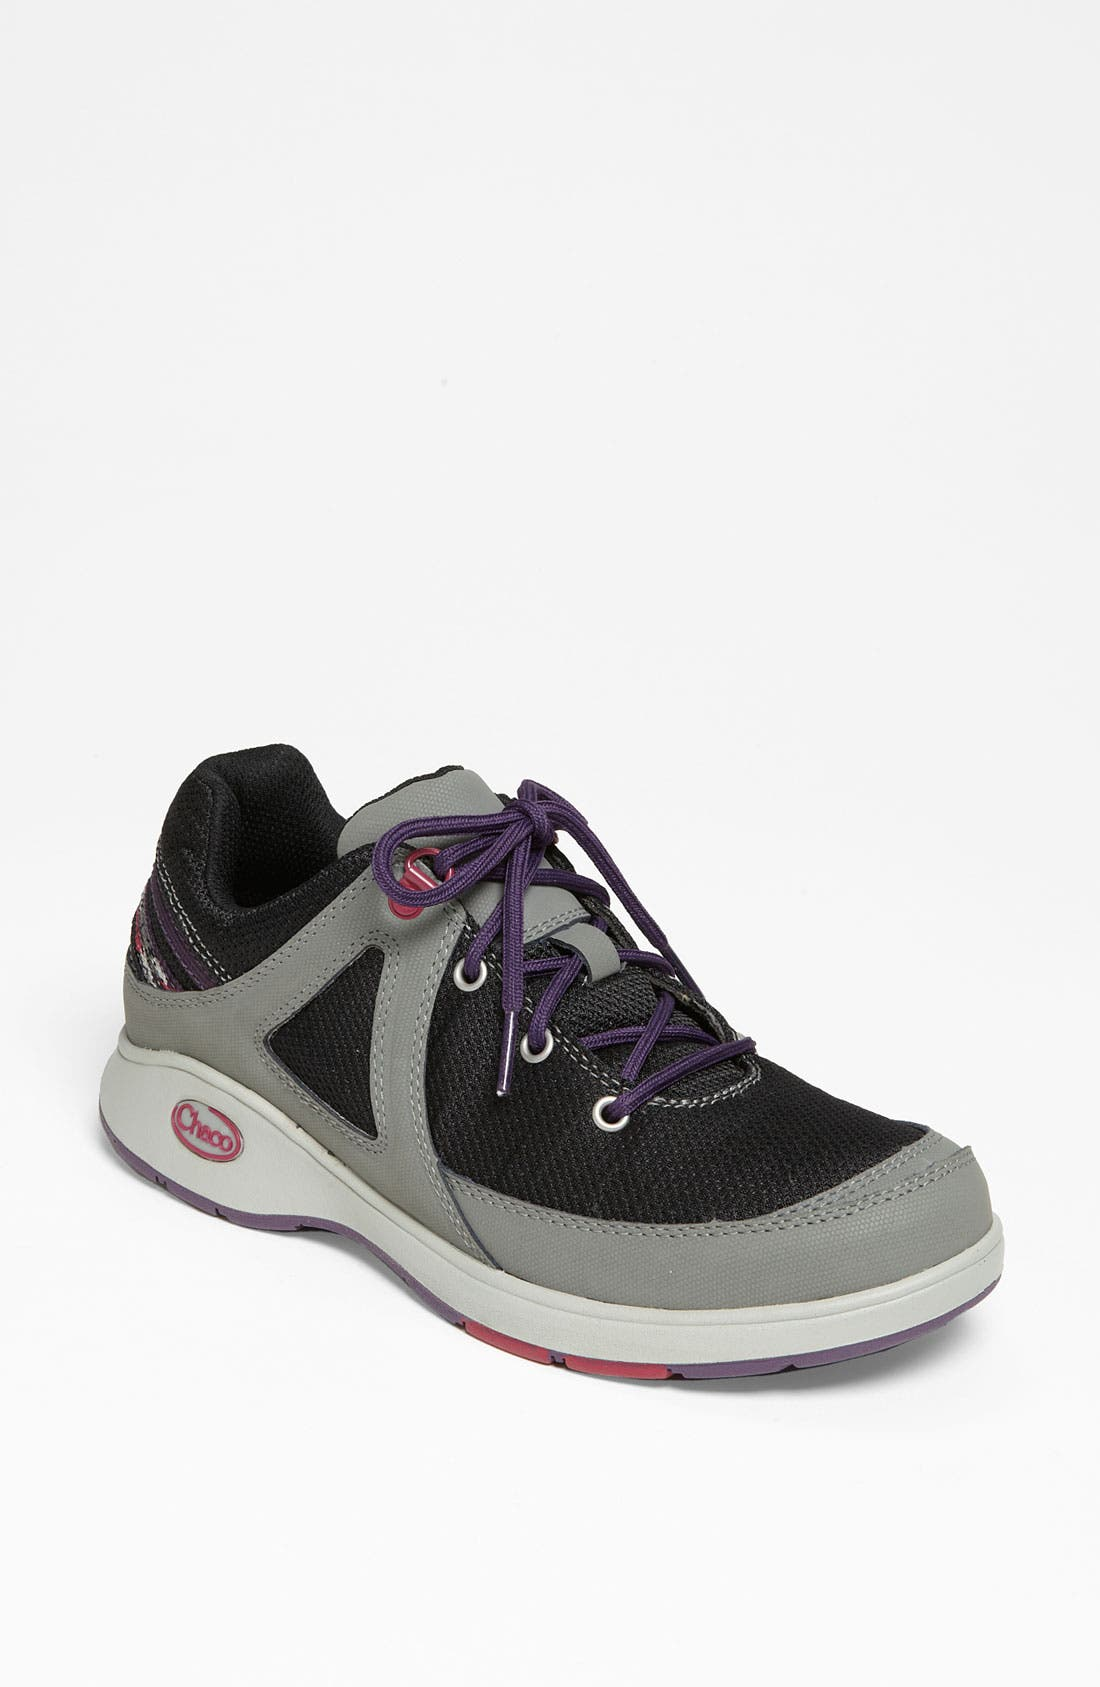 Main Image - Chaco 'Vika' Sneaker (Women)